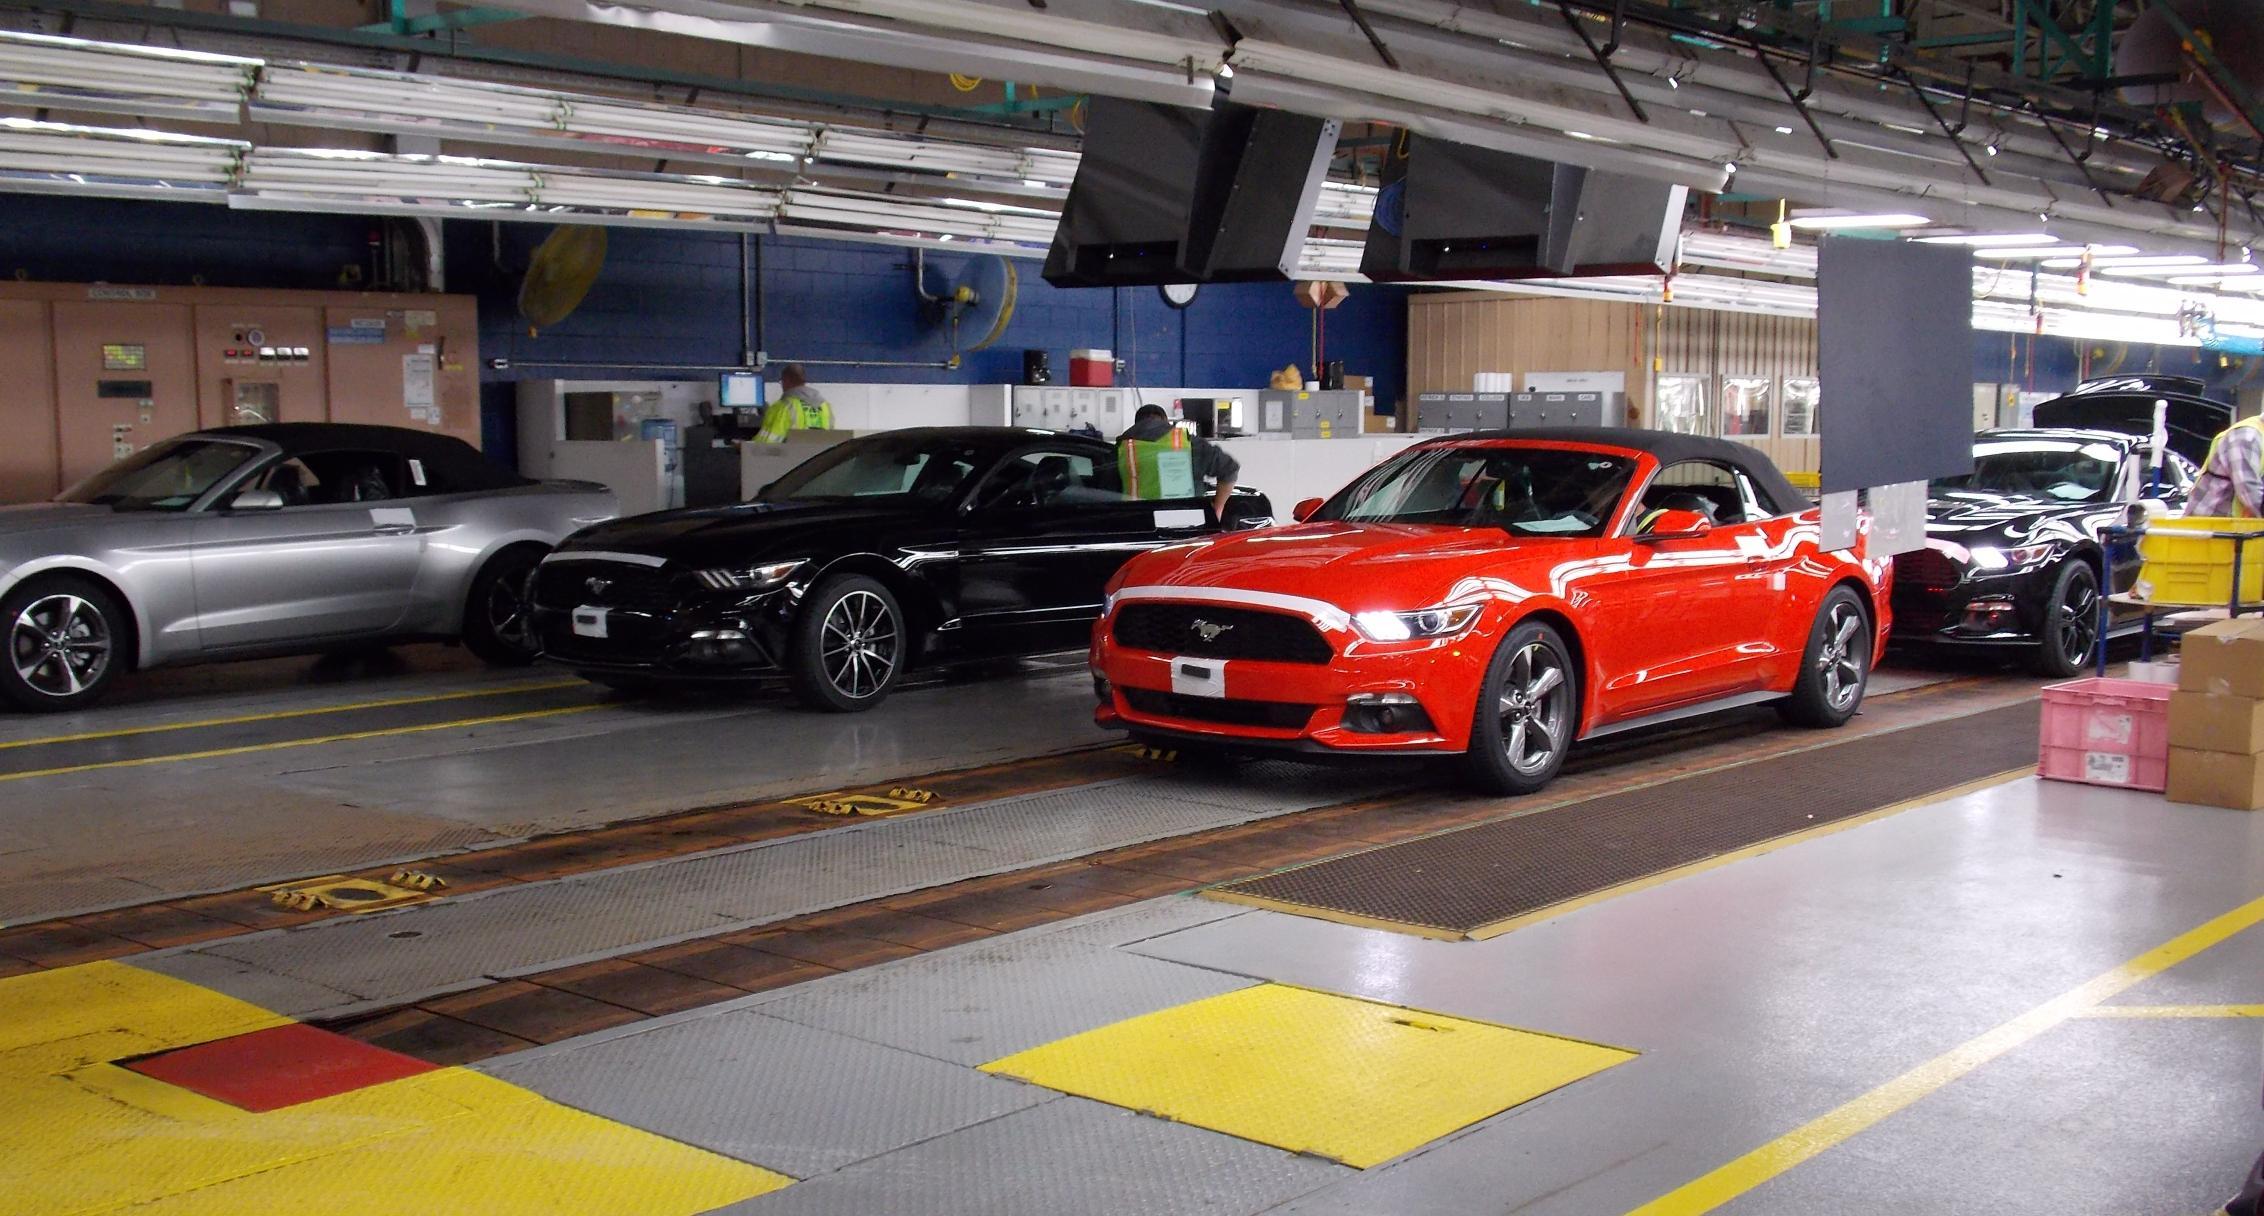 Detroit Car Dealership Shooting